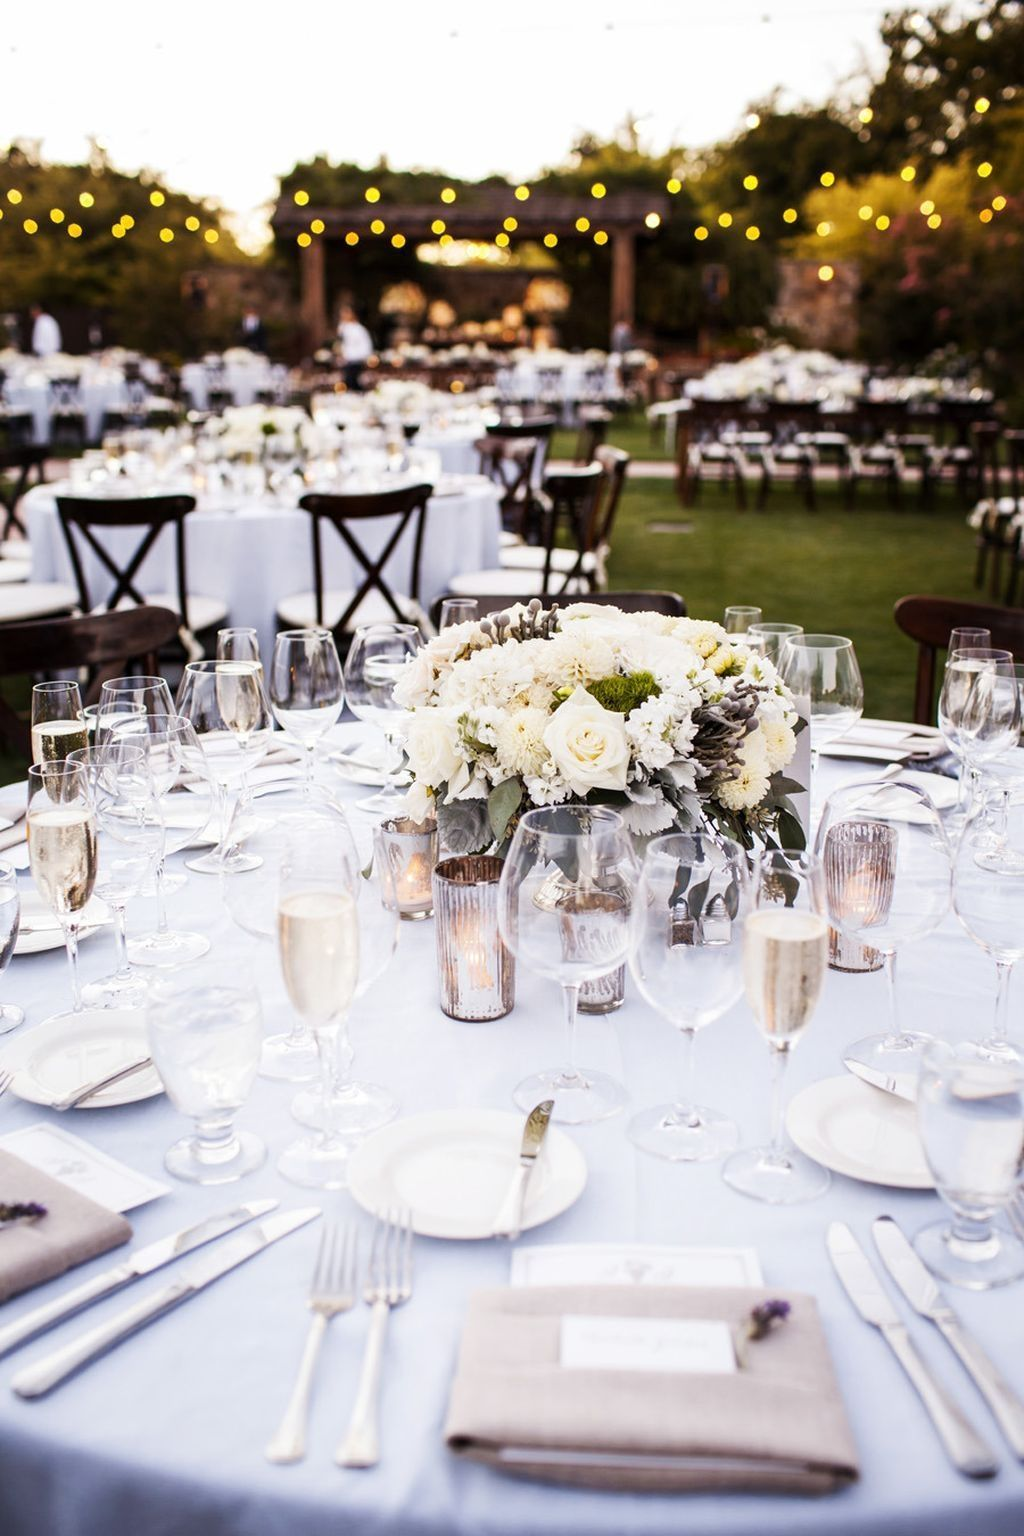 Wedding decoration ideas outside   Cheap but Elegant Outdoor Wedding Centerpieces Ideas  Pinterest